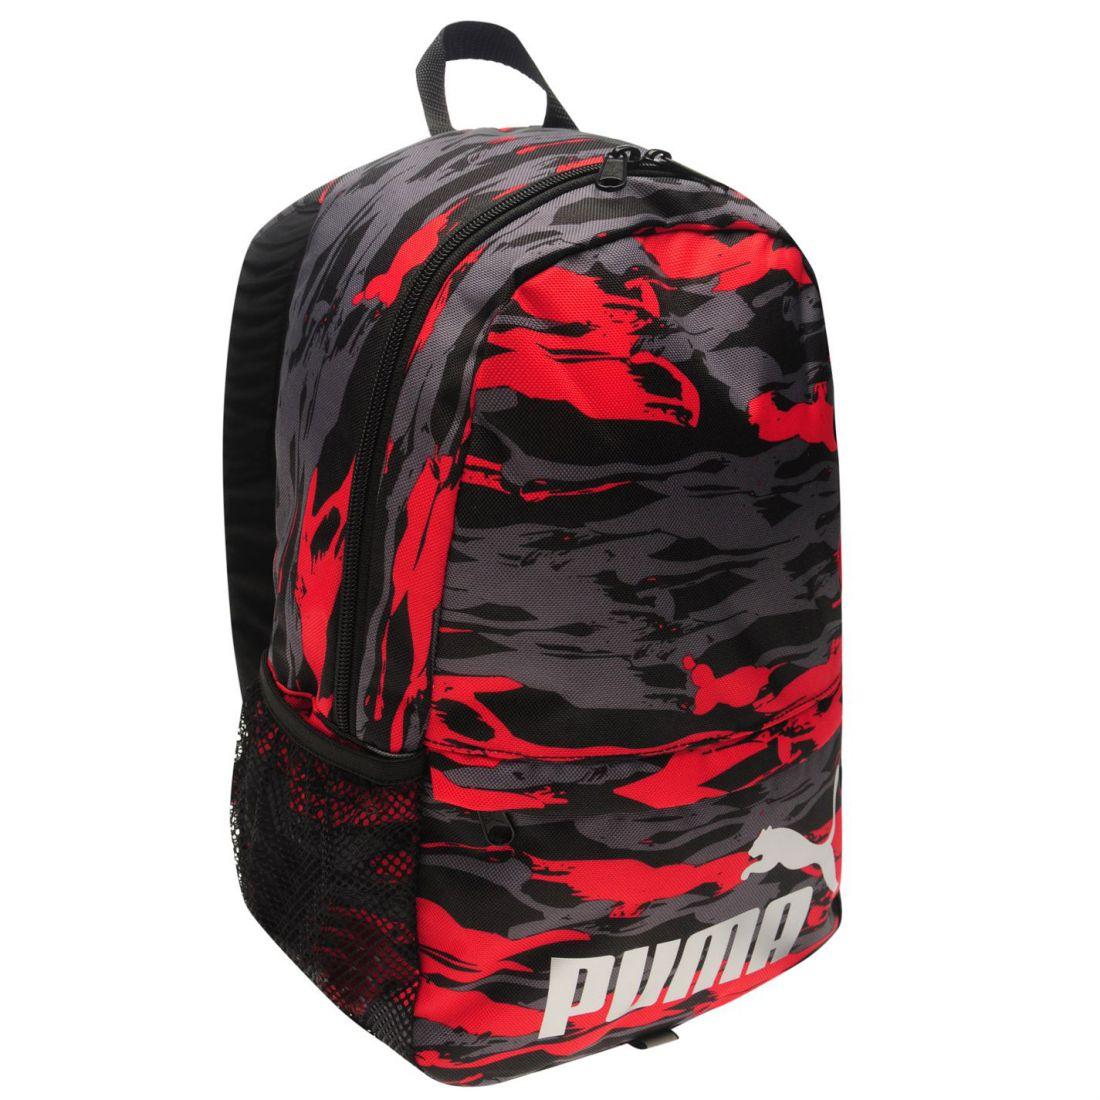 80ae053210195 Puma Mini Backpack Unisex Back Pack Zip Mesh Stamp 2 2 sur 3 ...